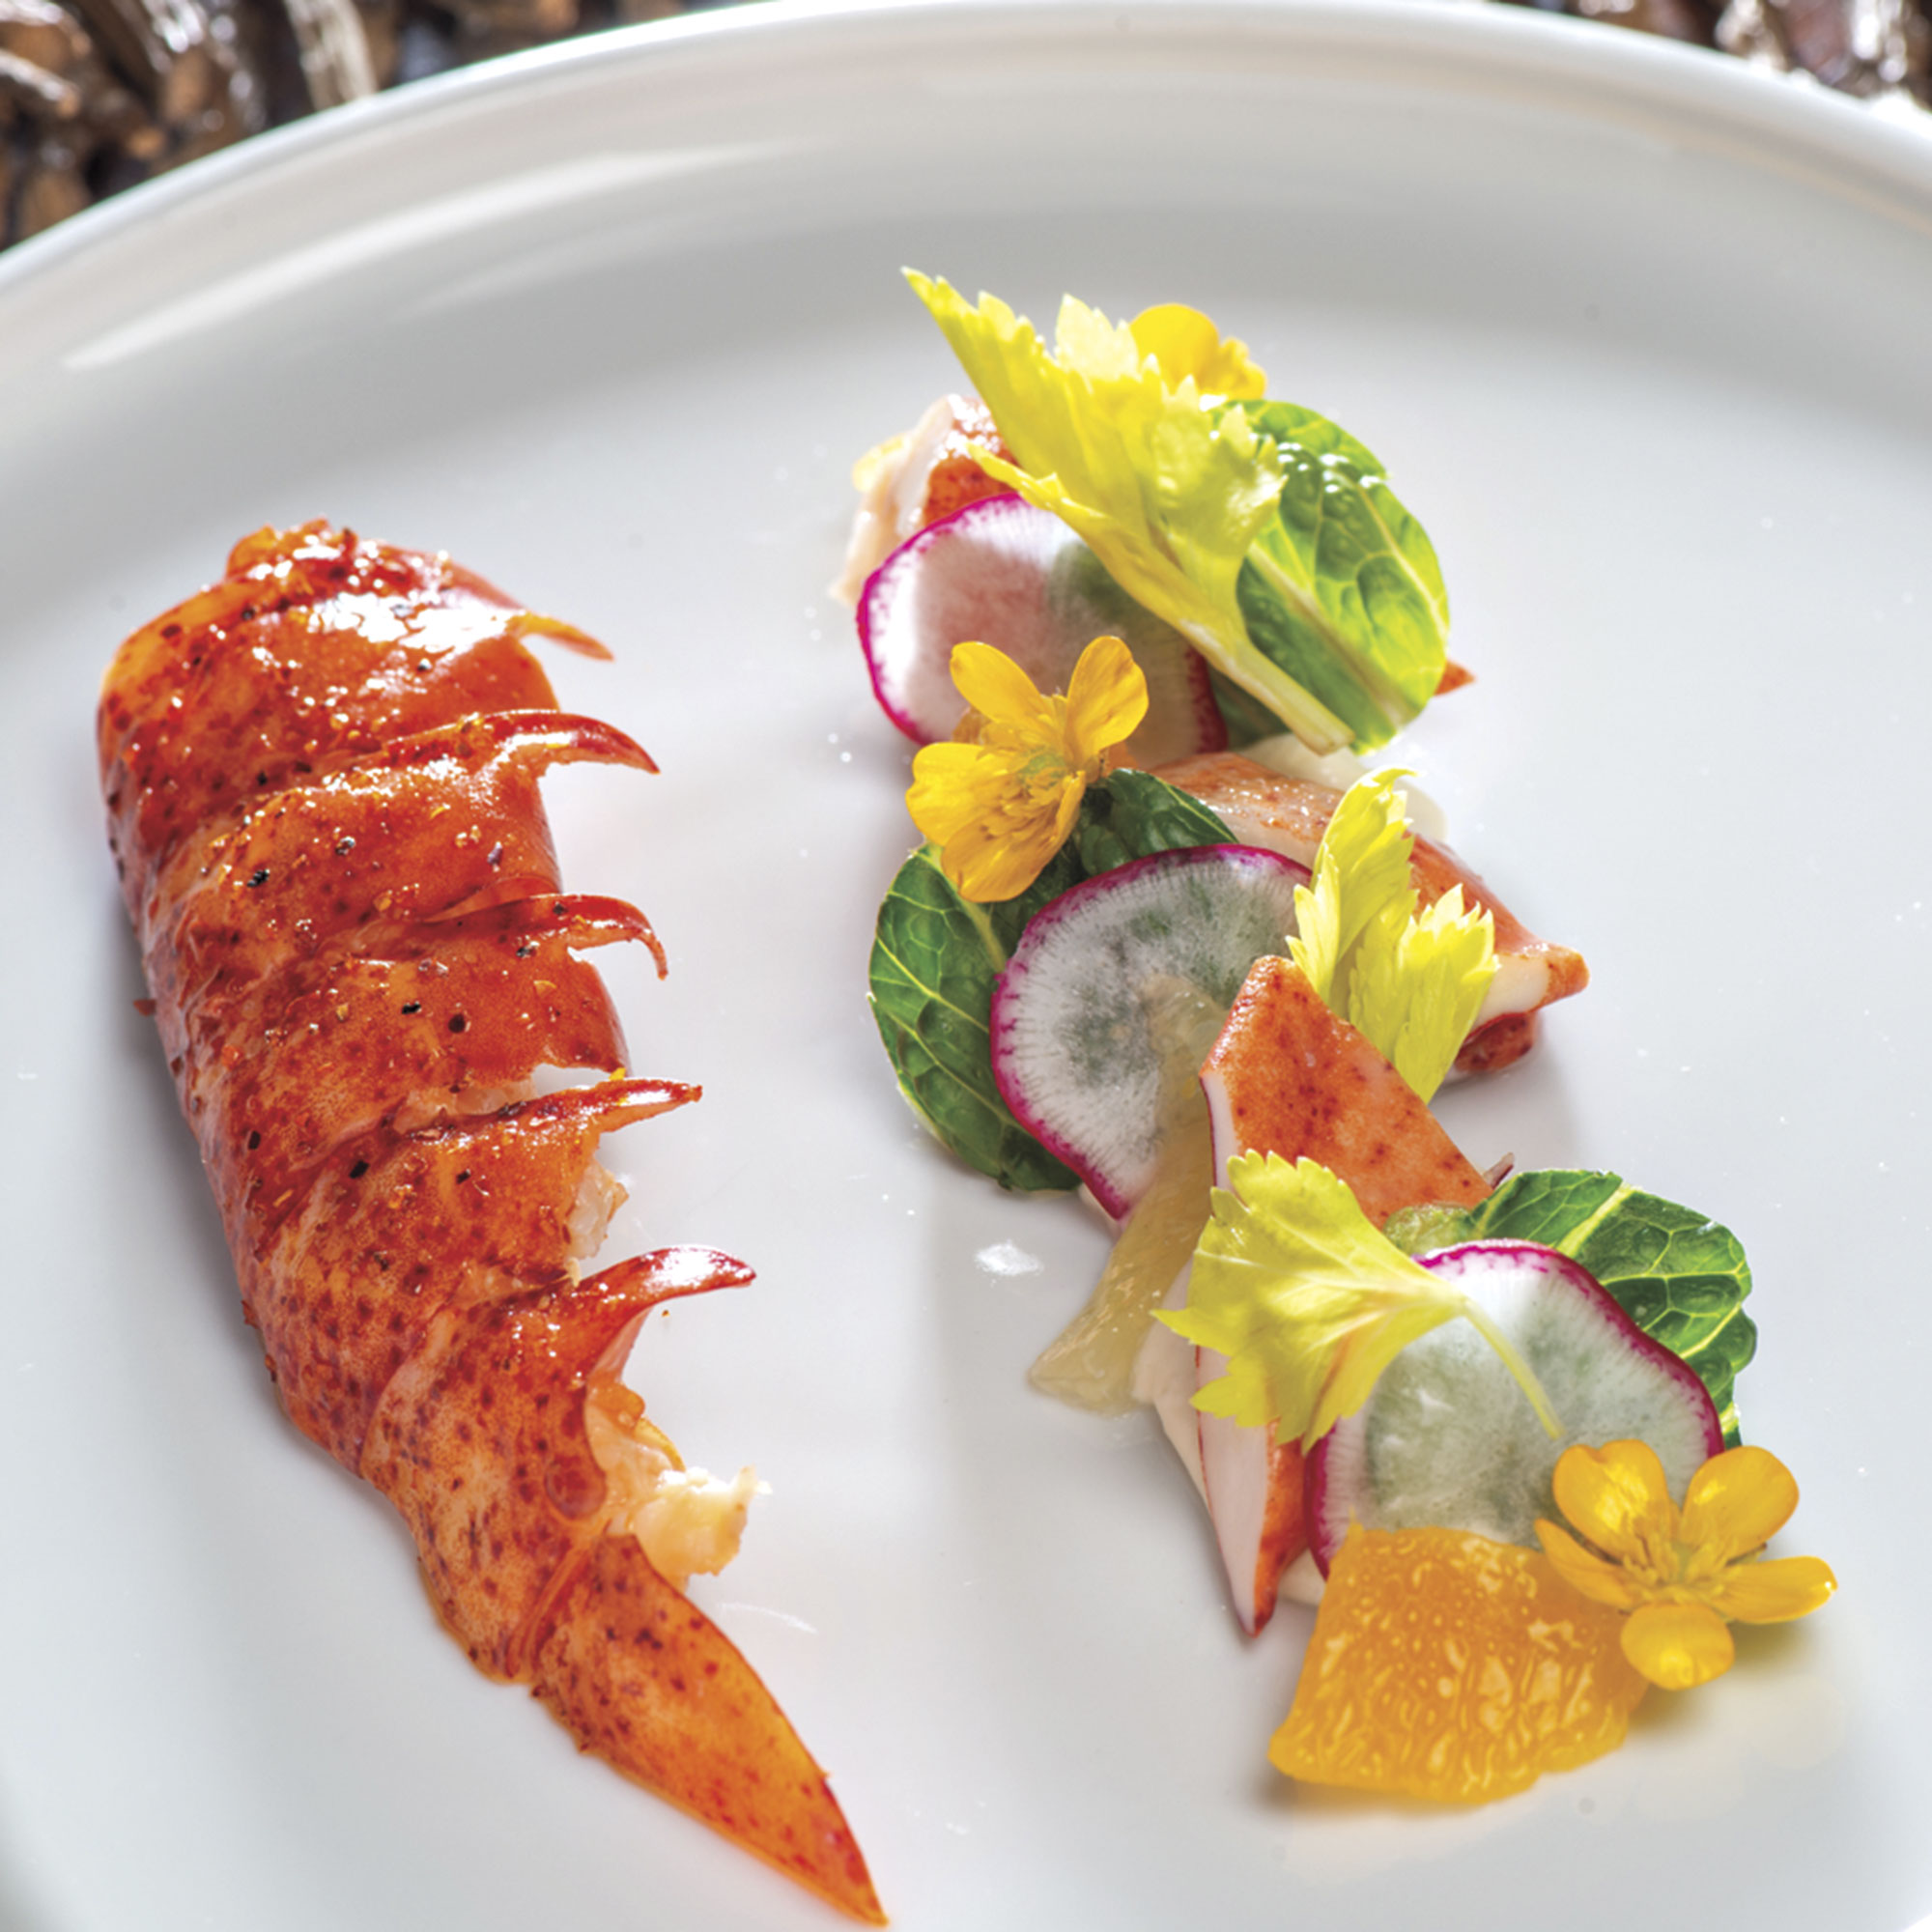 poached Maine lobster salad with citrus supremes, celery and radish; Photo courtesy Lake Kora